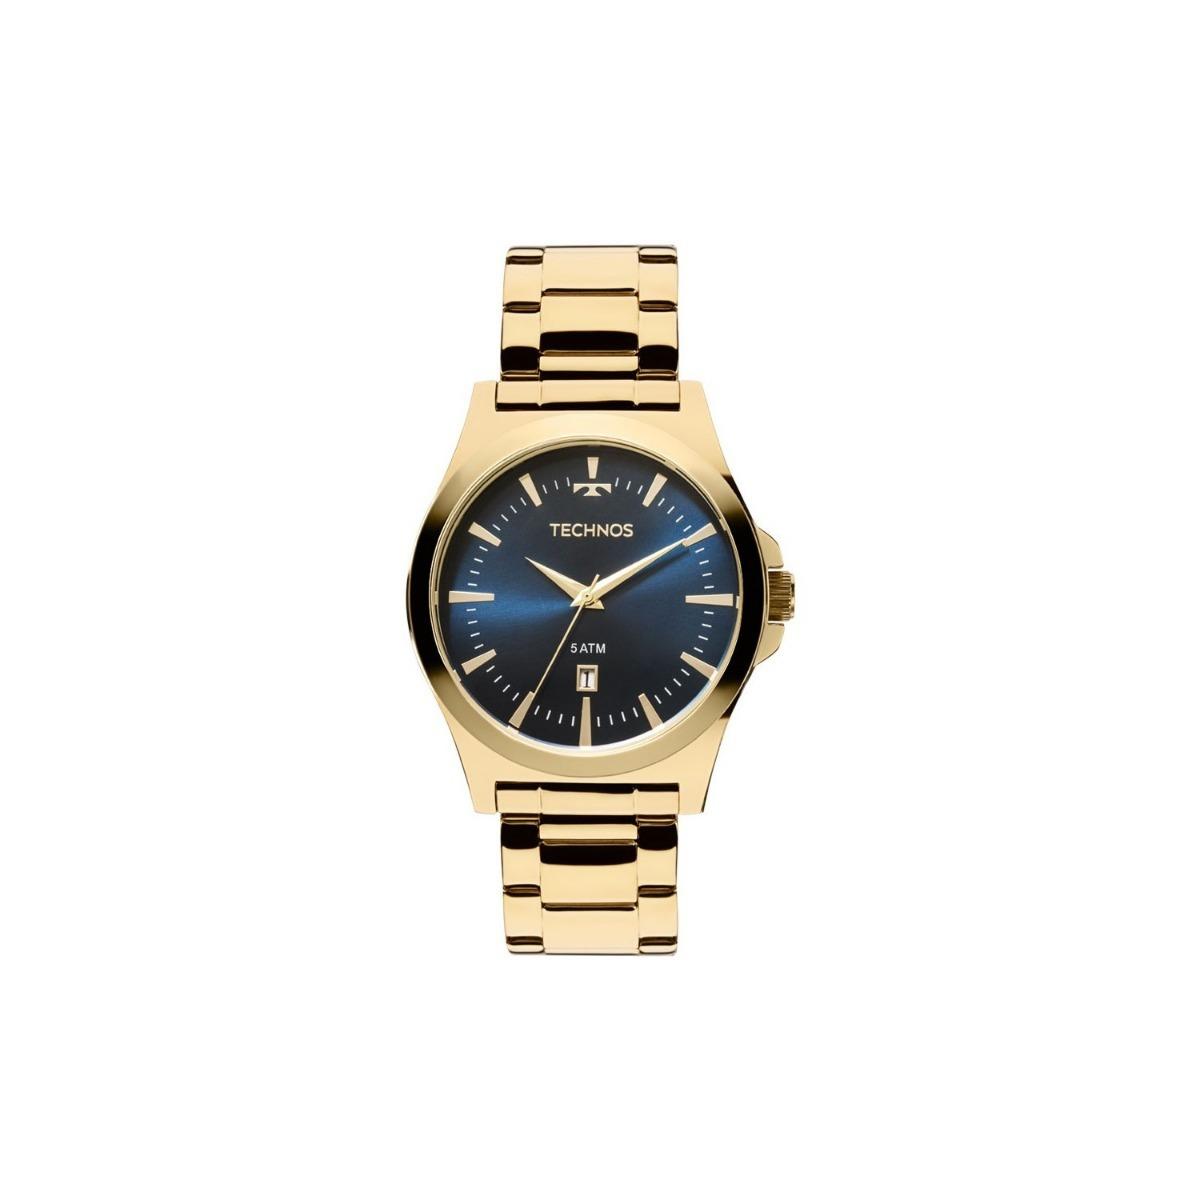 7a9c49c1cd9e4 Relógio Technos Classic Steel 2115lan 4a Masculino - R  275,00 em ...